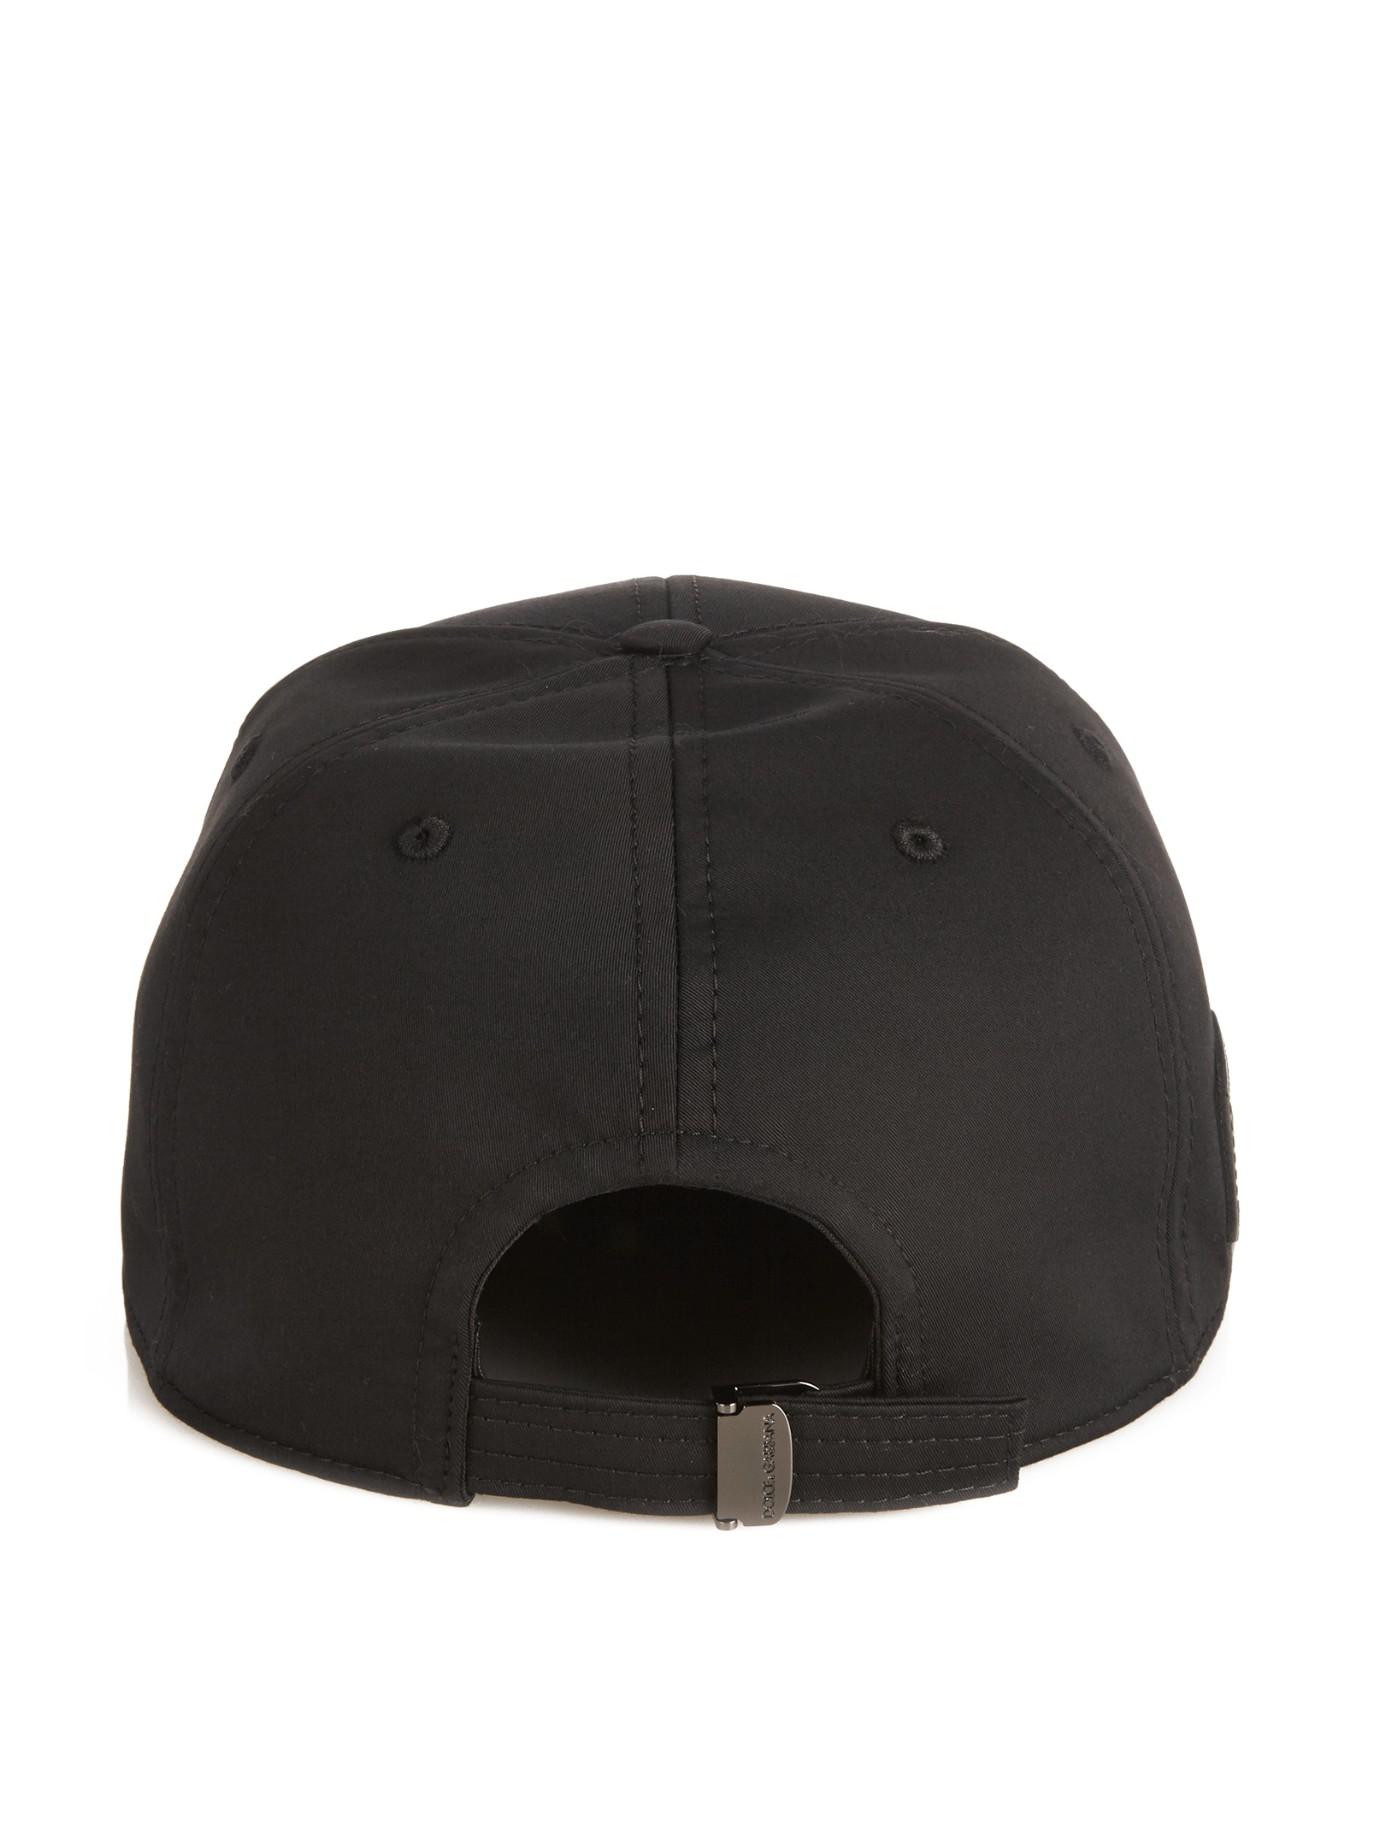 ed5abcc1080c6 Dolce   gabbana Logo-plaque Baseball Hat in Black for Men